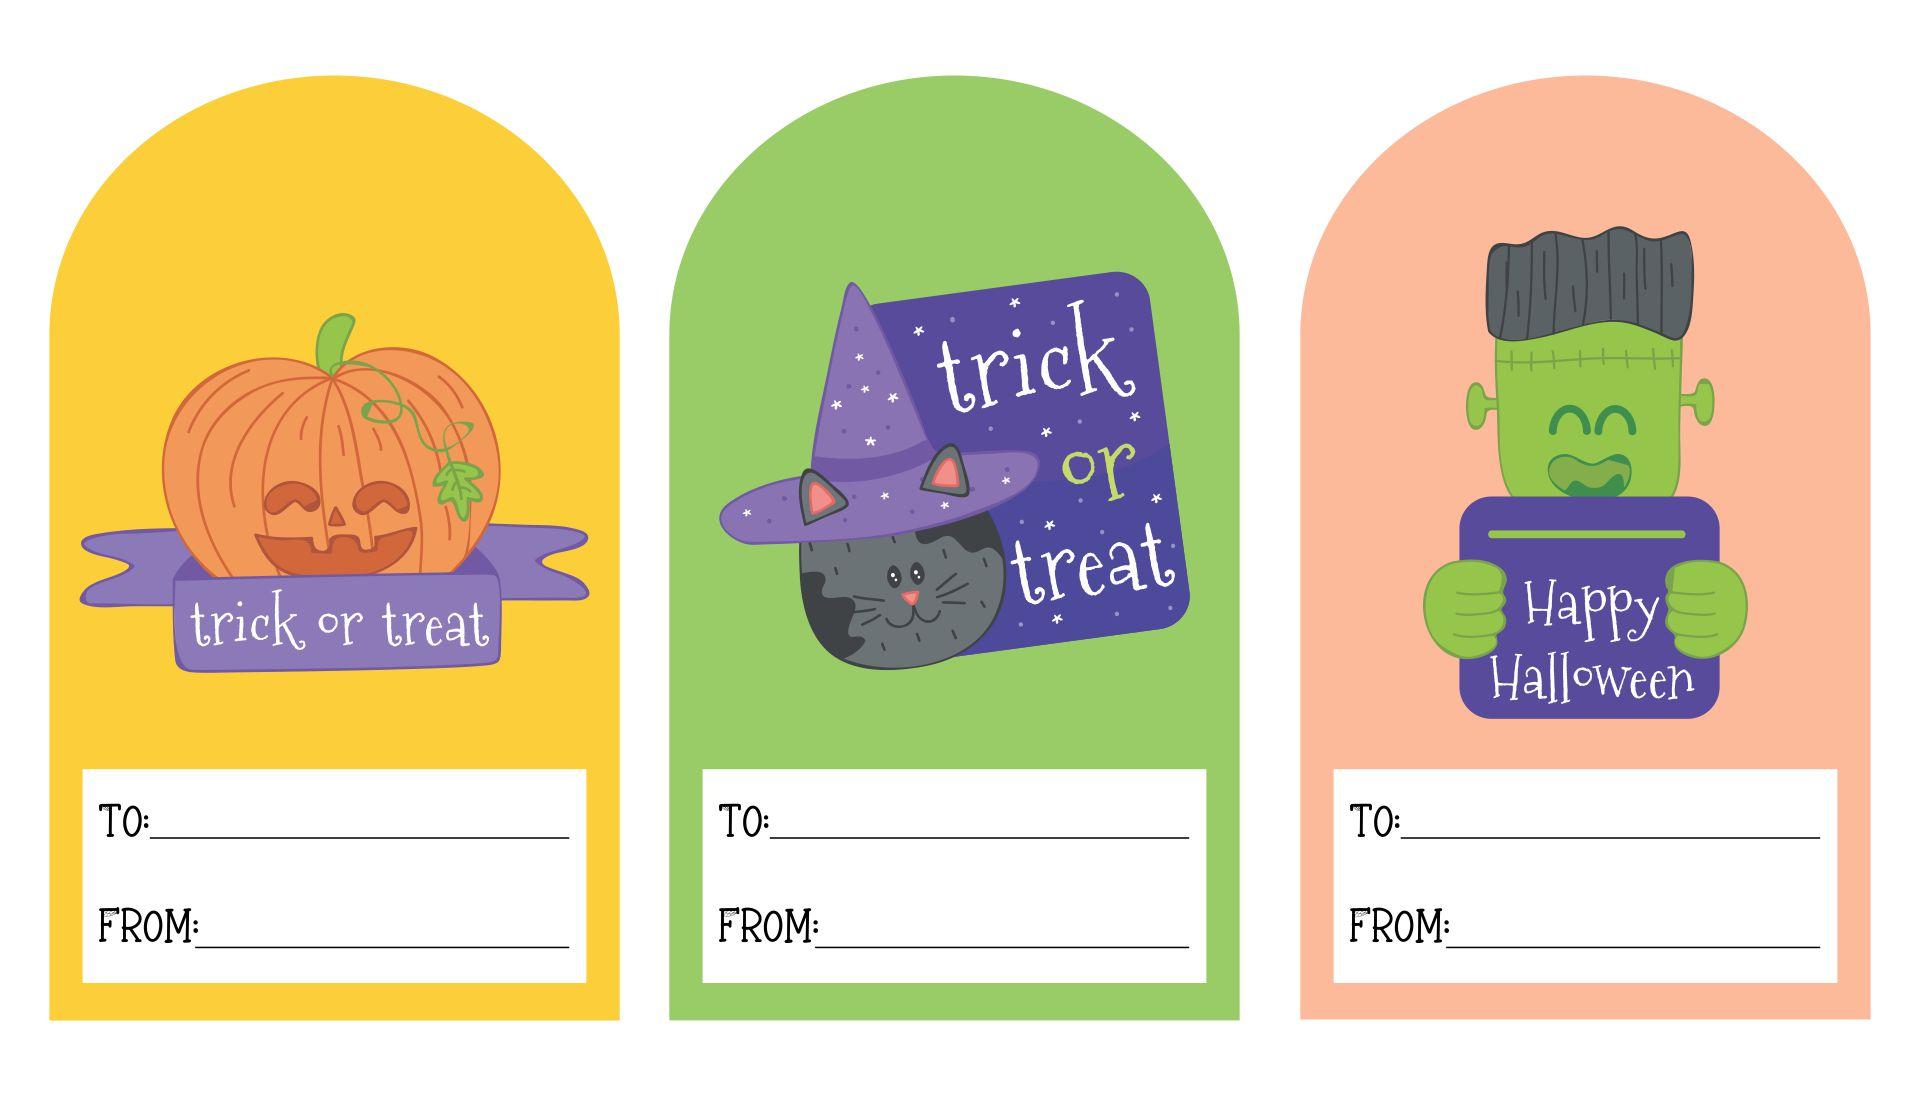 Happy Halloween Gift Tags Printable